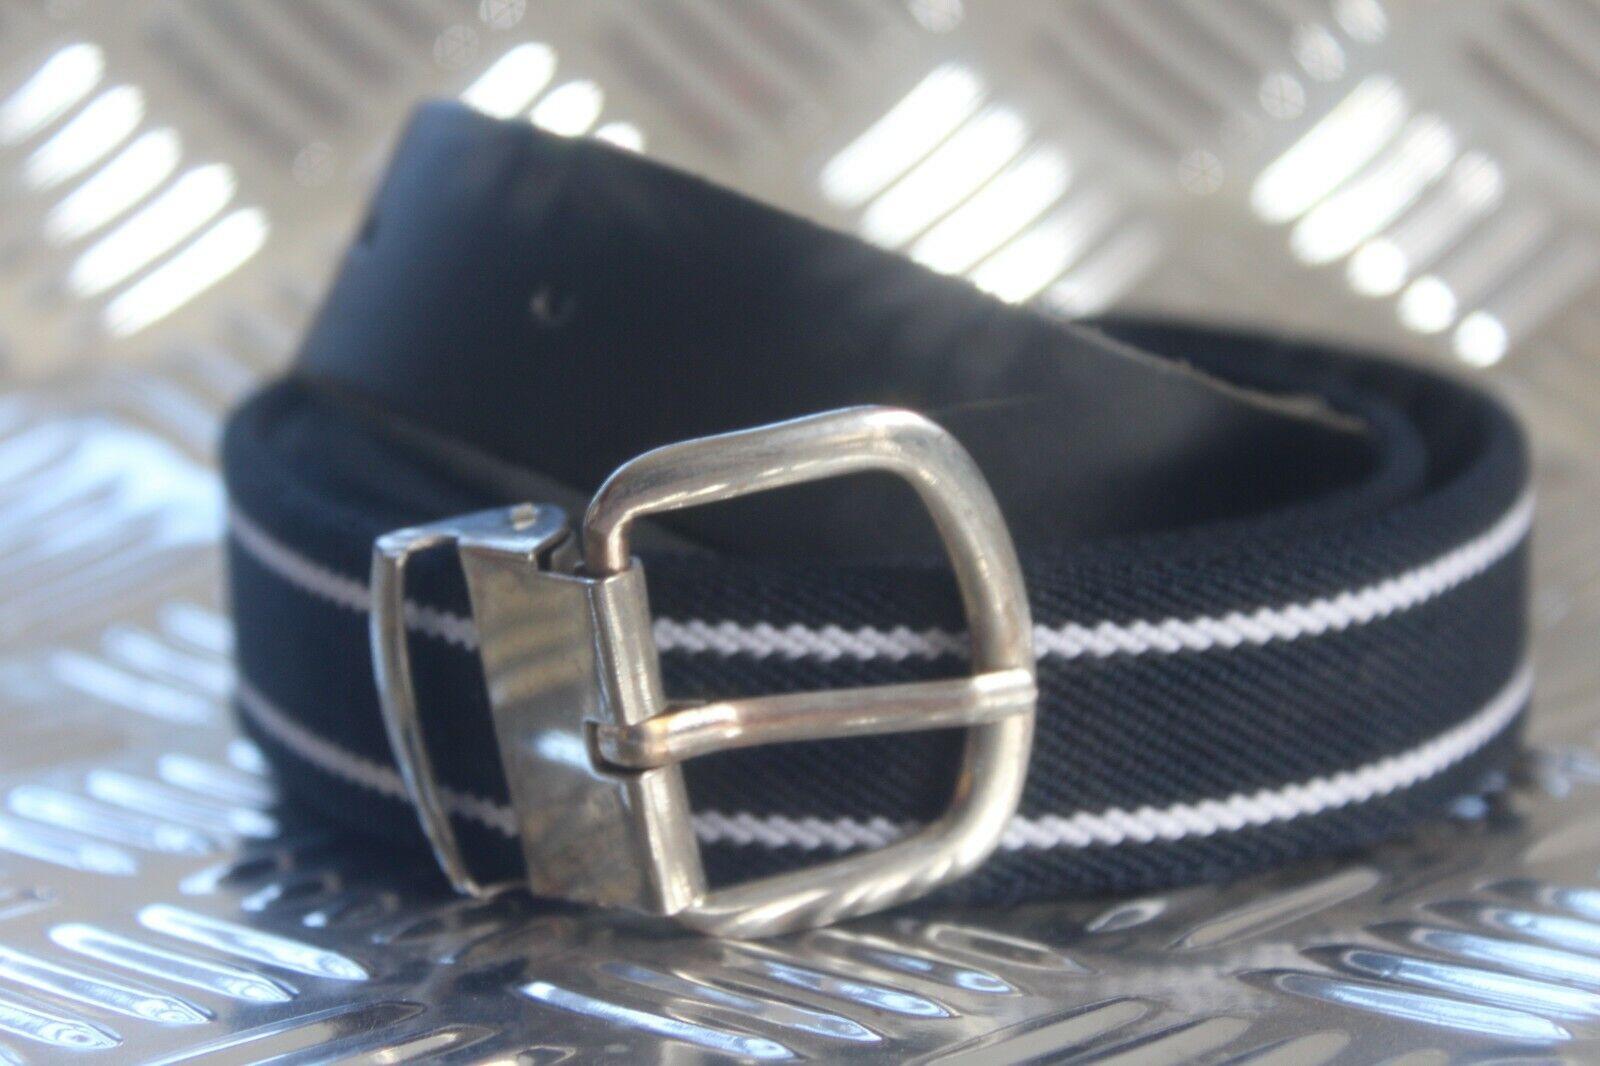 Belt Stretchgürtel Stretchy Elastic Belt Blue with 2 White Stripes